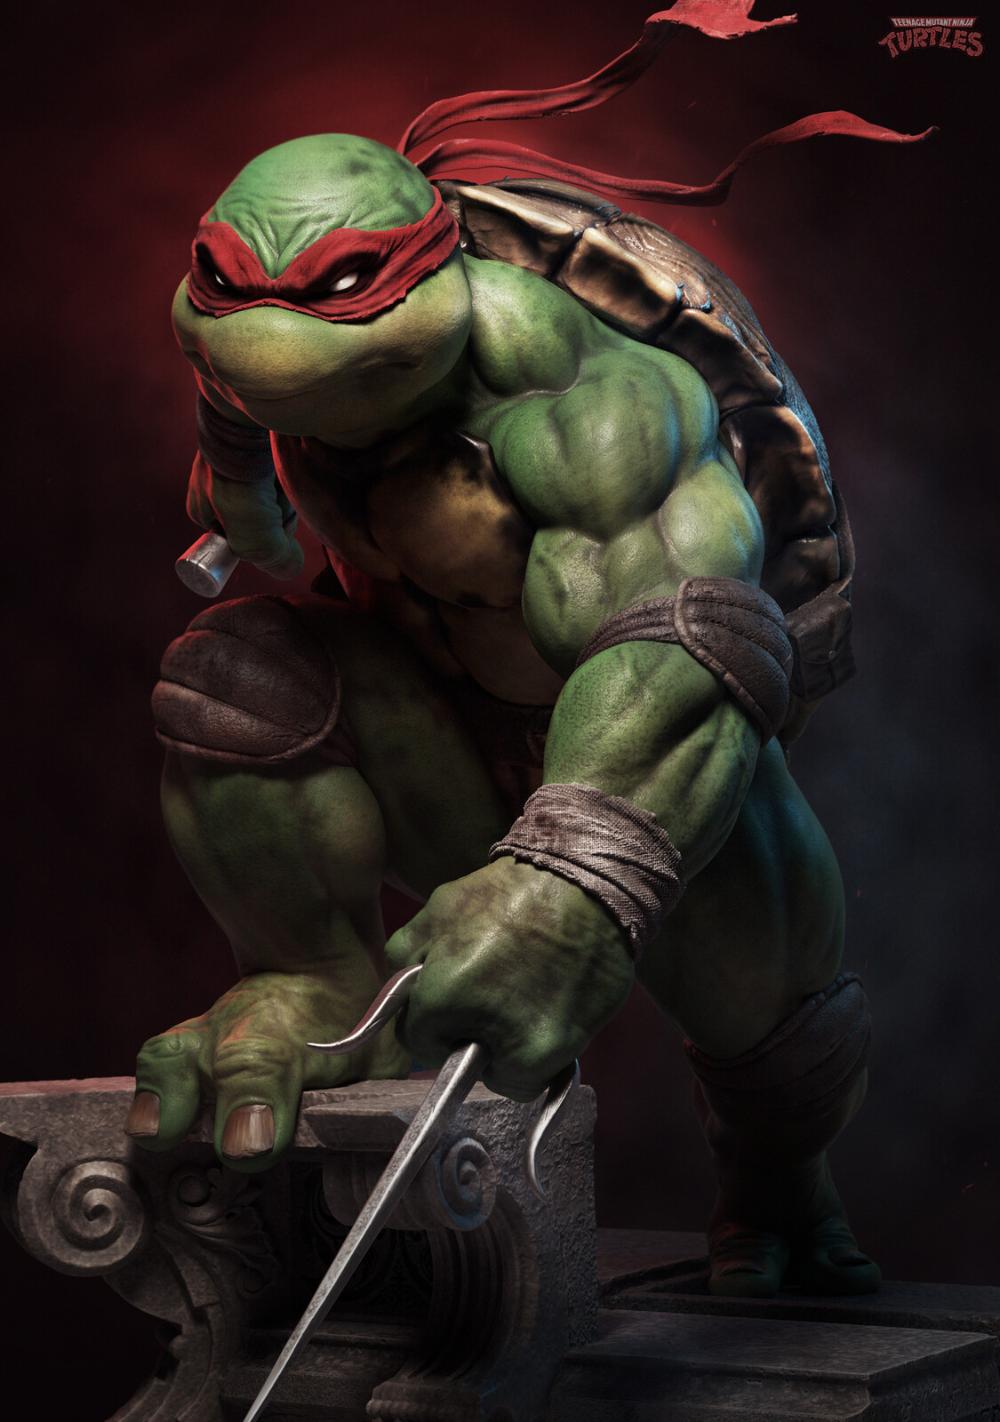 Artstation Raphael Tiago Rios In Teenage Mutant Ninja Turtles Artwork Teenage Mutant Ninja Turtles Art Tmnt Artwork